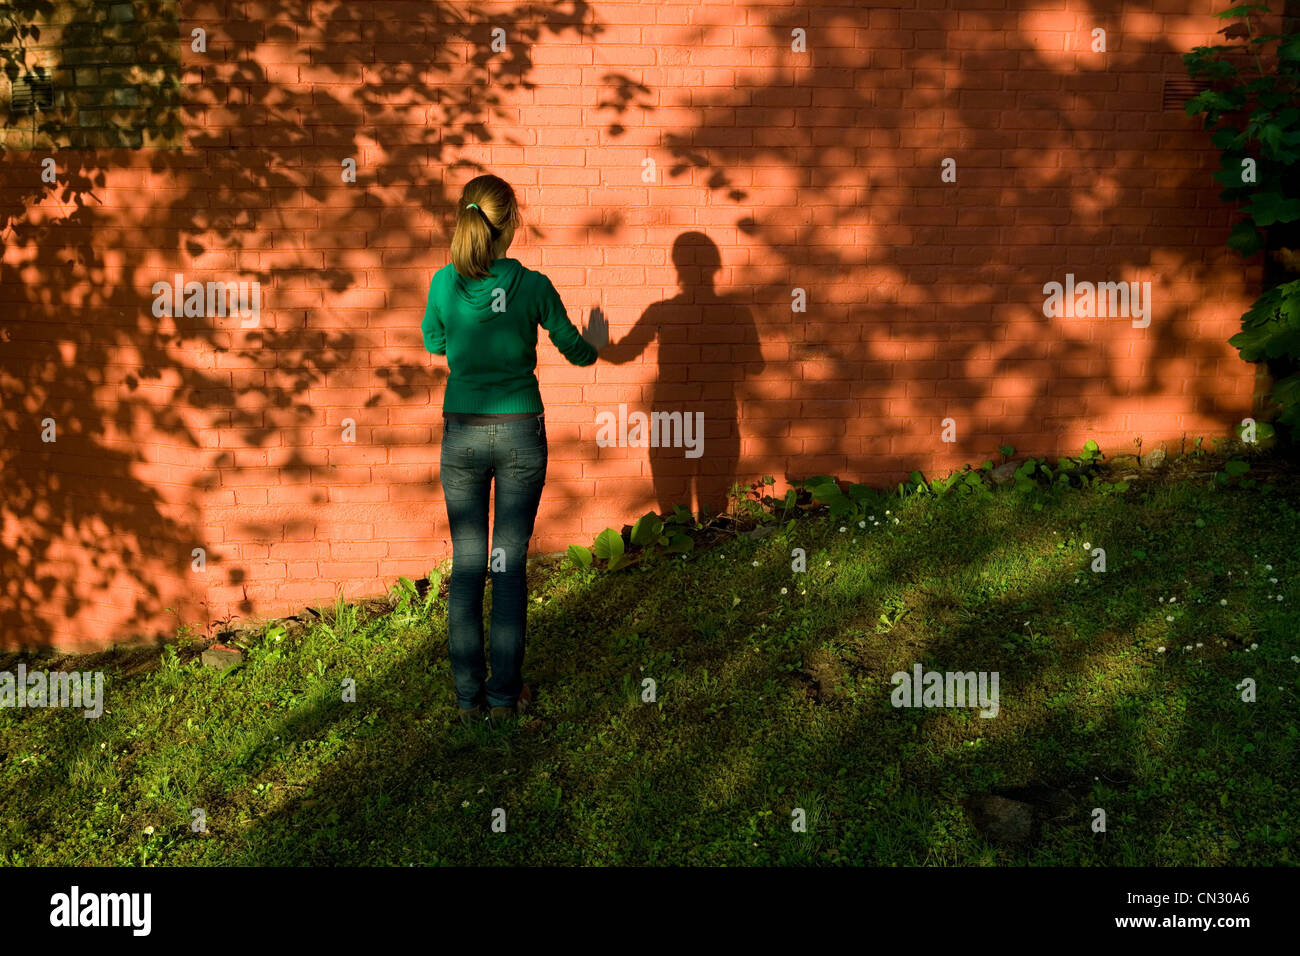 Teenage girl standing by brick wall - Stock Image